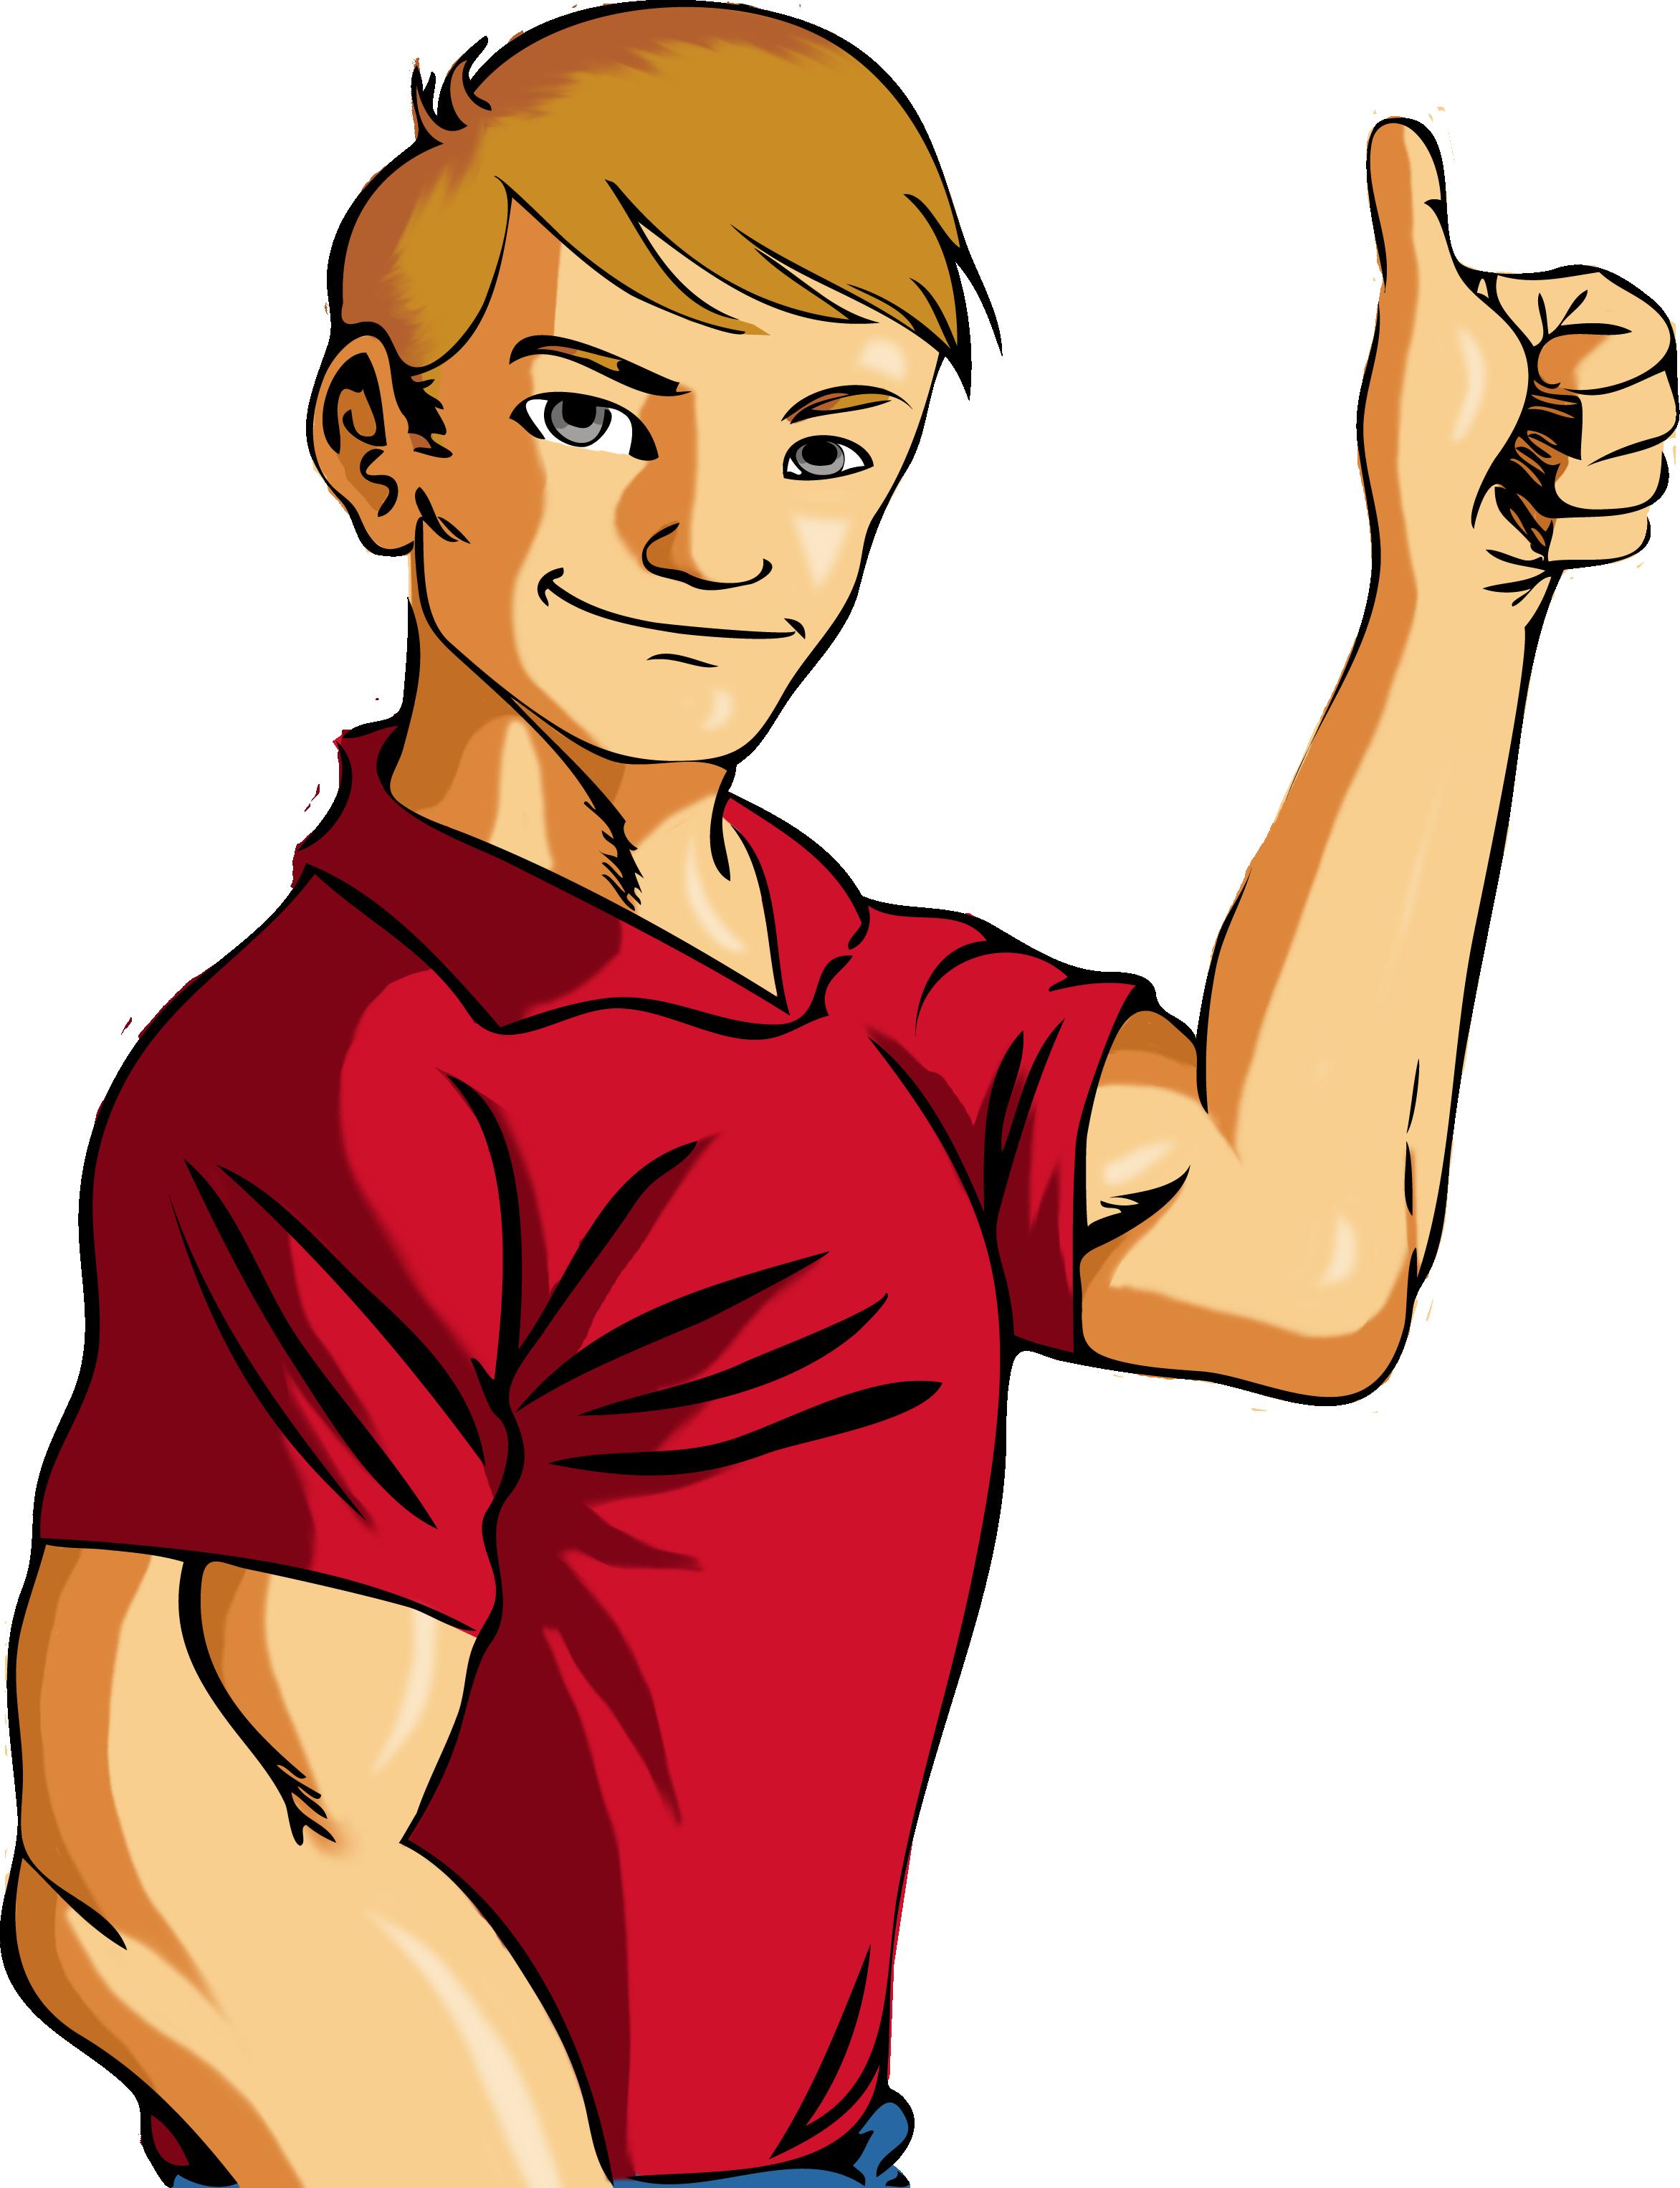 torres-salu2_ilustrator